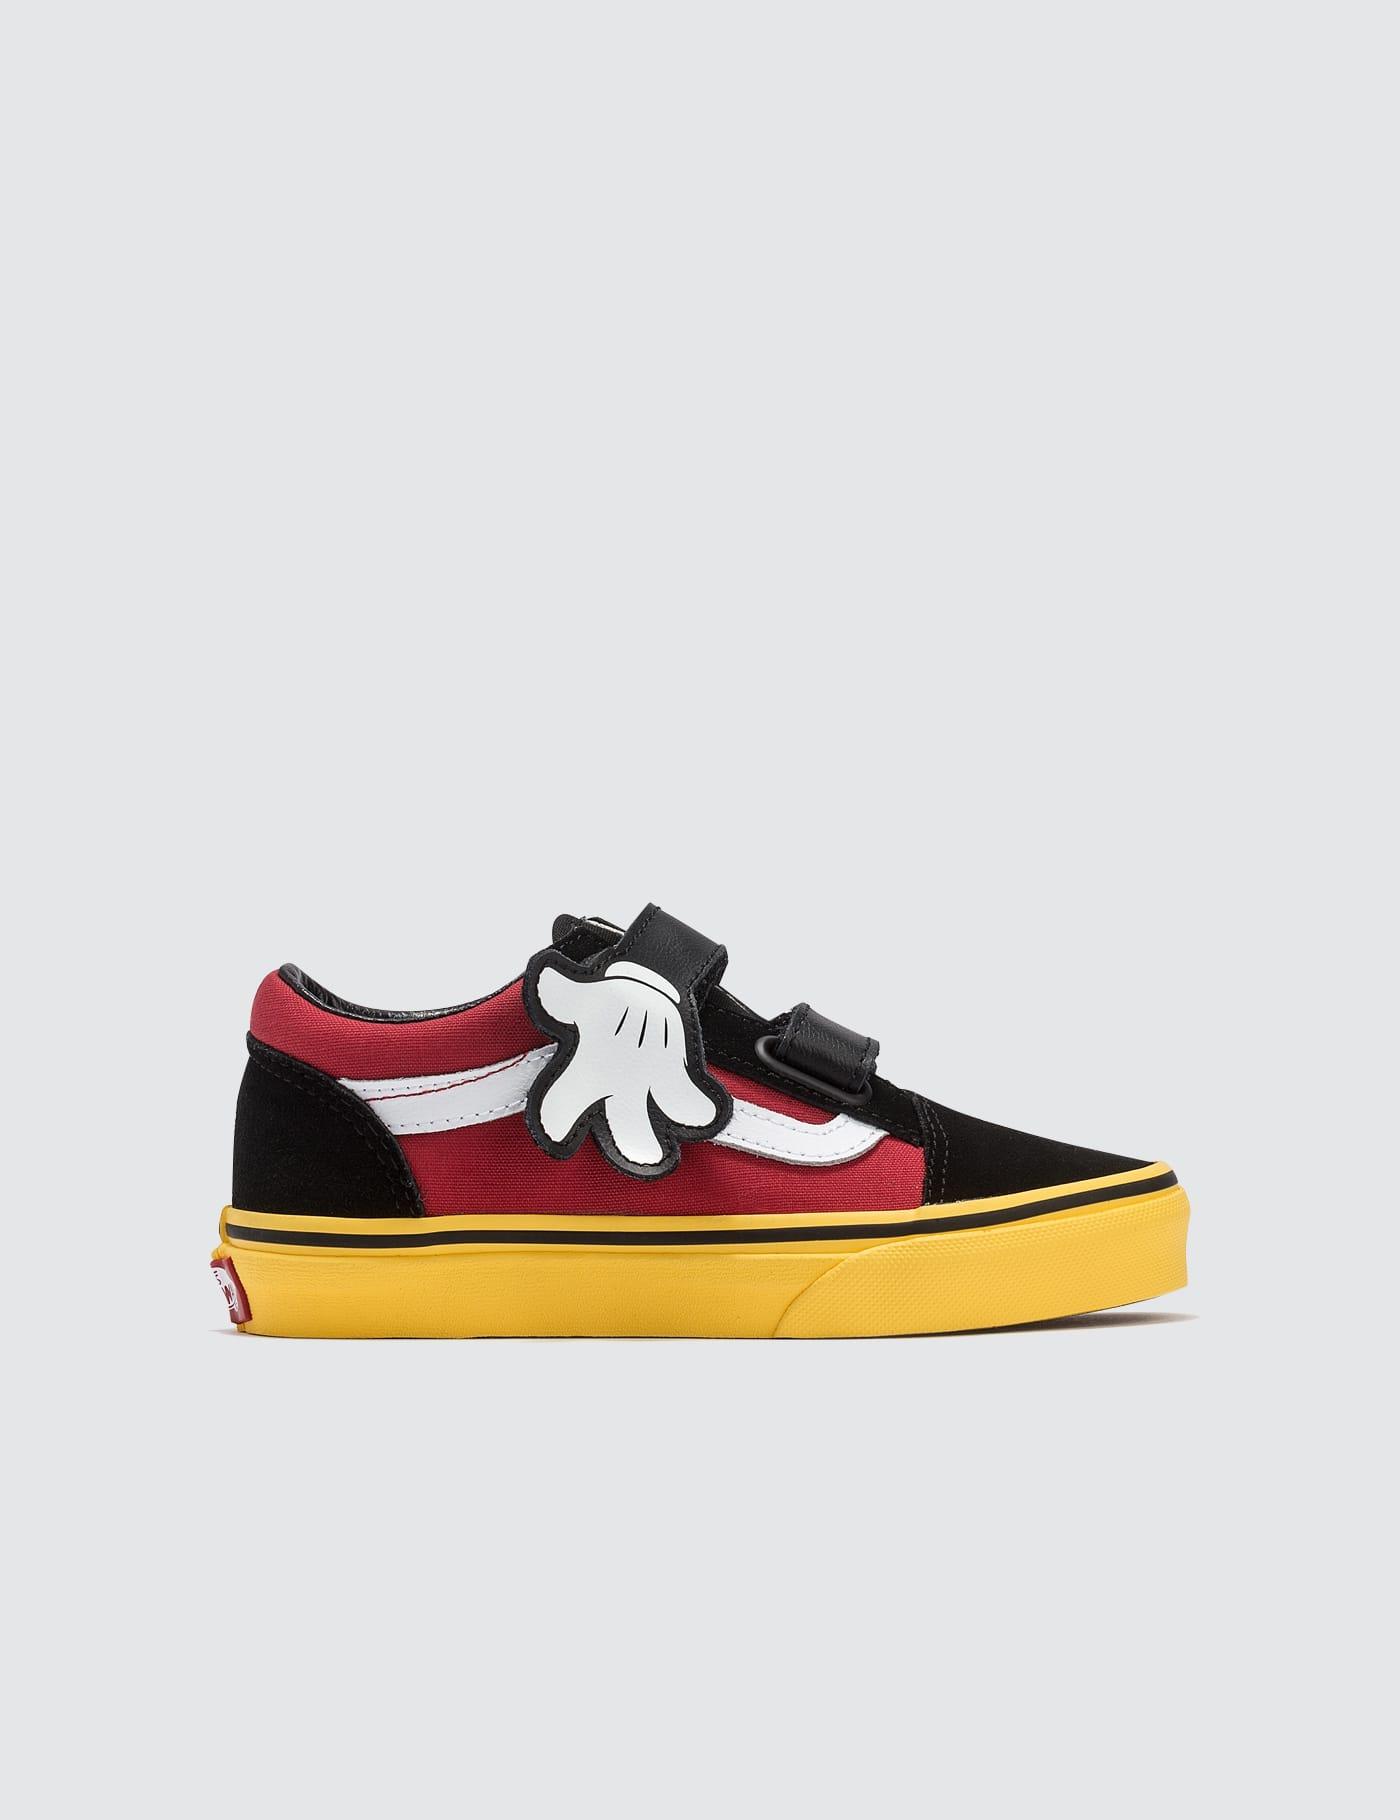 Vans - Disney x Vans Old Skool V Kids   HBX